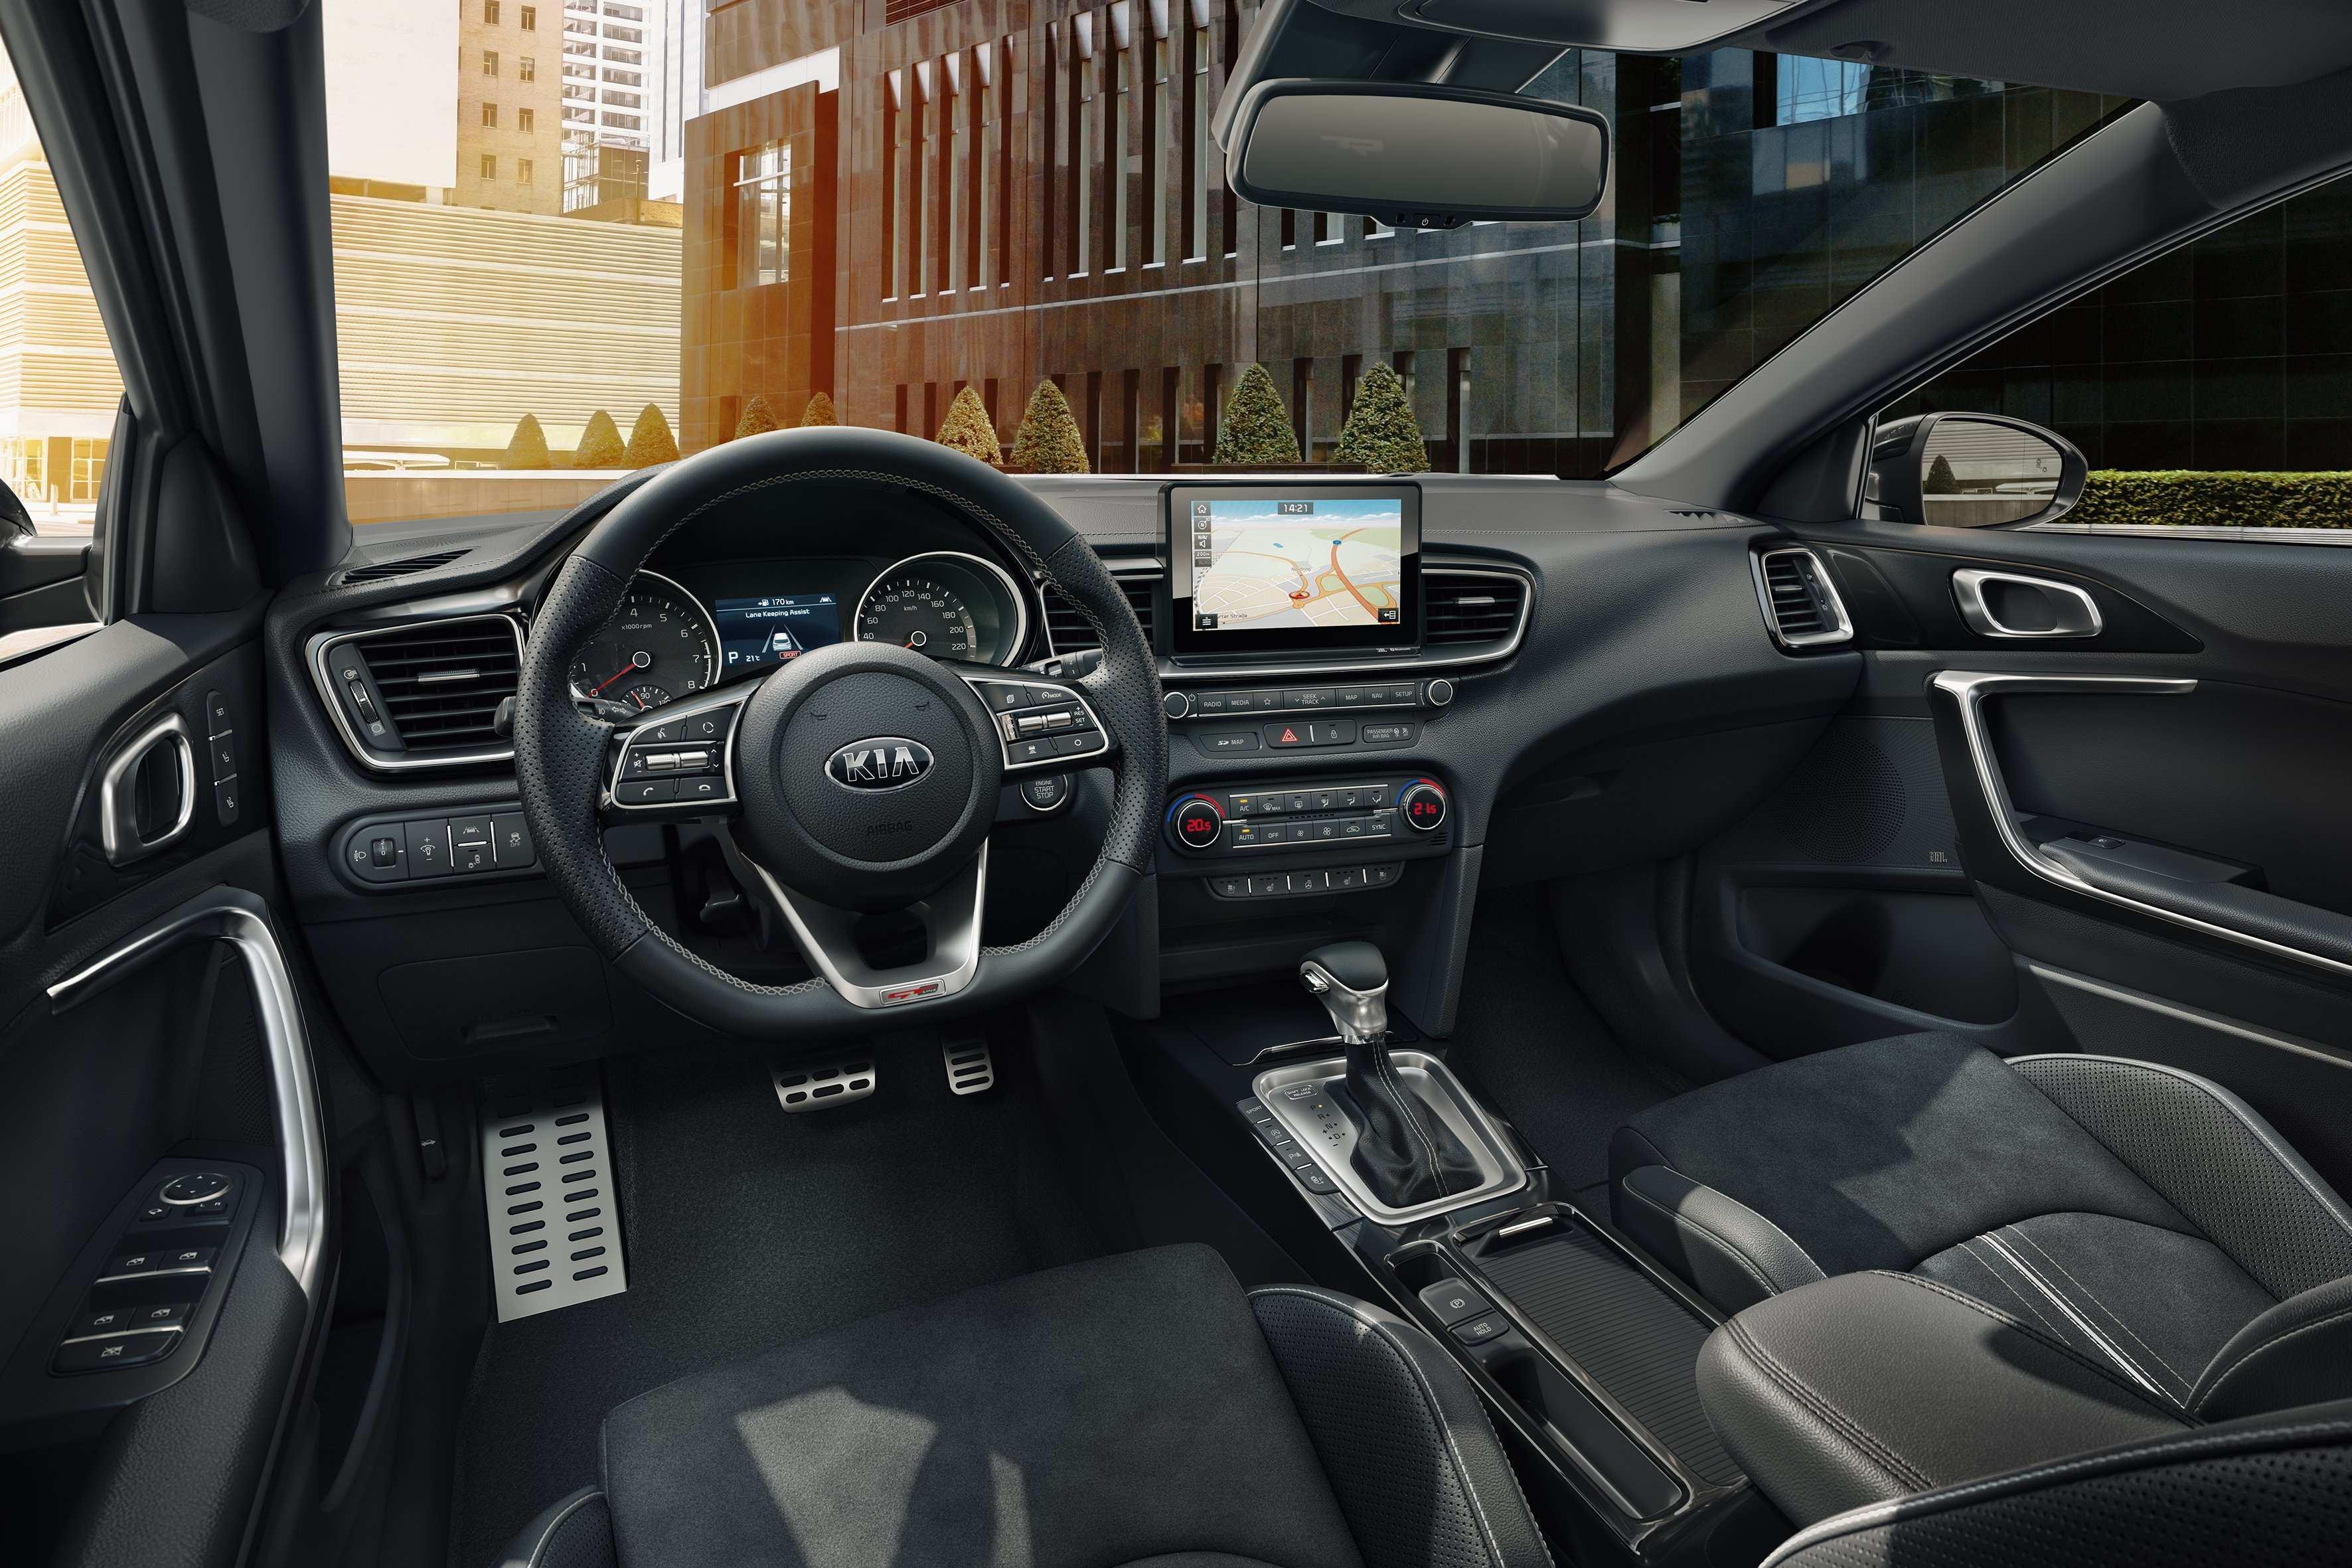 21 Great The Kia Ceed 2019 Interior Interior Exterior And Review Engine by The Kia Ceed 2019 Interior Interior Exterior And Review